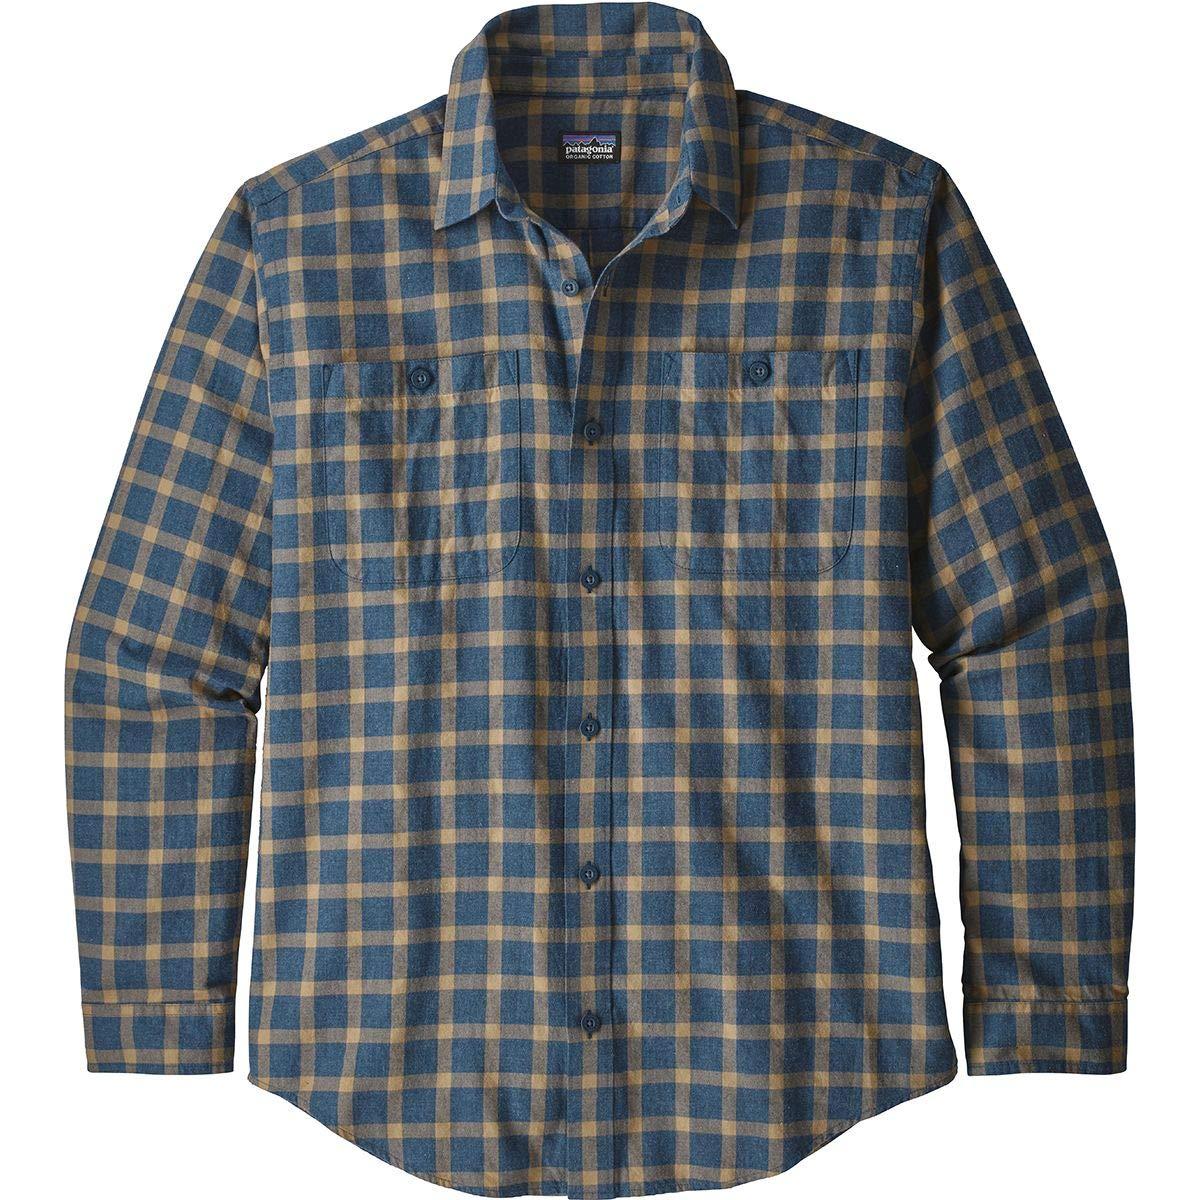 Patagonia M 'S Pima L/S Shirt, Herren Herren Shirt, 81a8e1